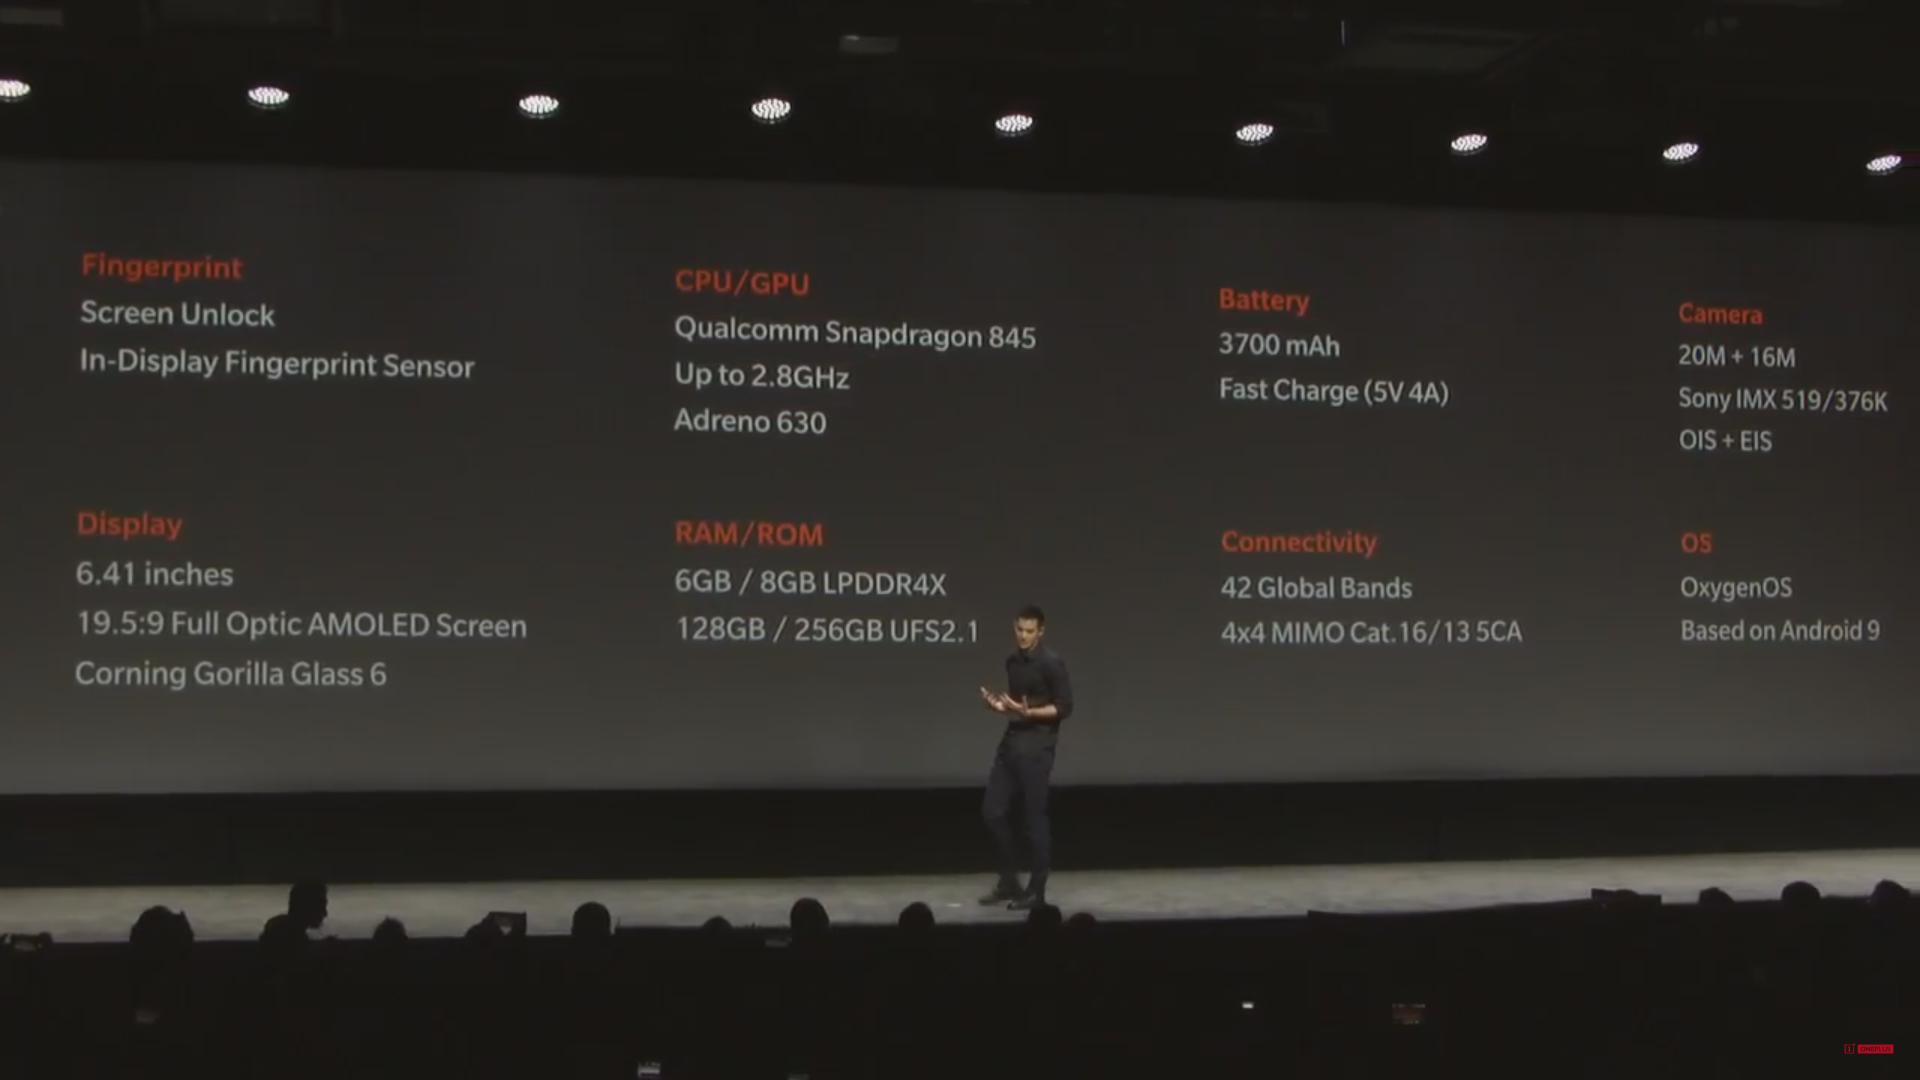 Oneplus تزيح الستار عن Oneplus 6T وبعض الاكسسوارات الجديدة 3